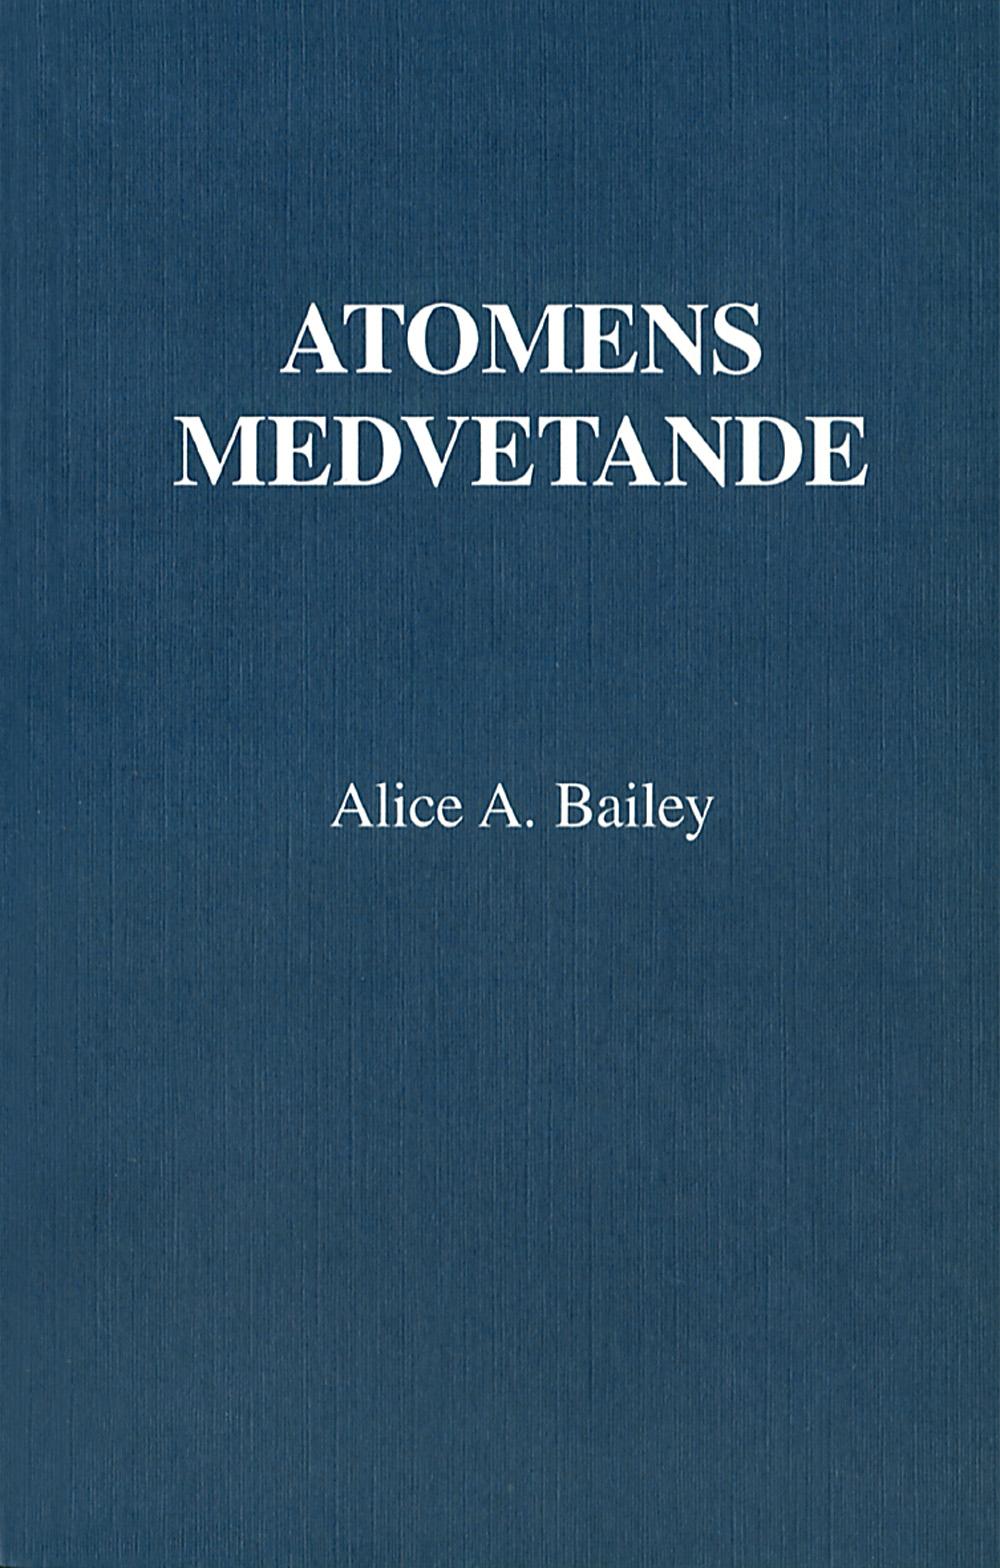 Atomens medvetande av Alice A Bailey